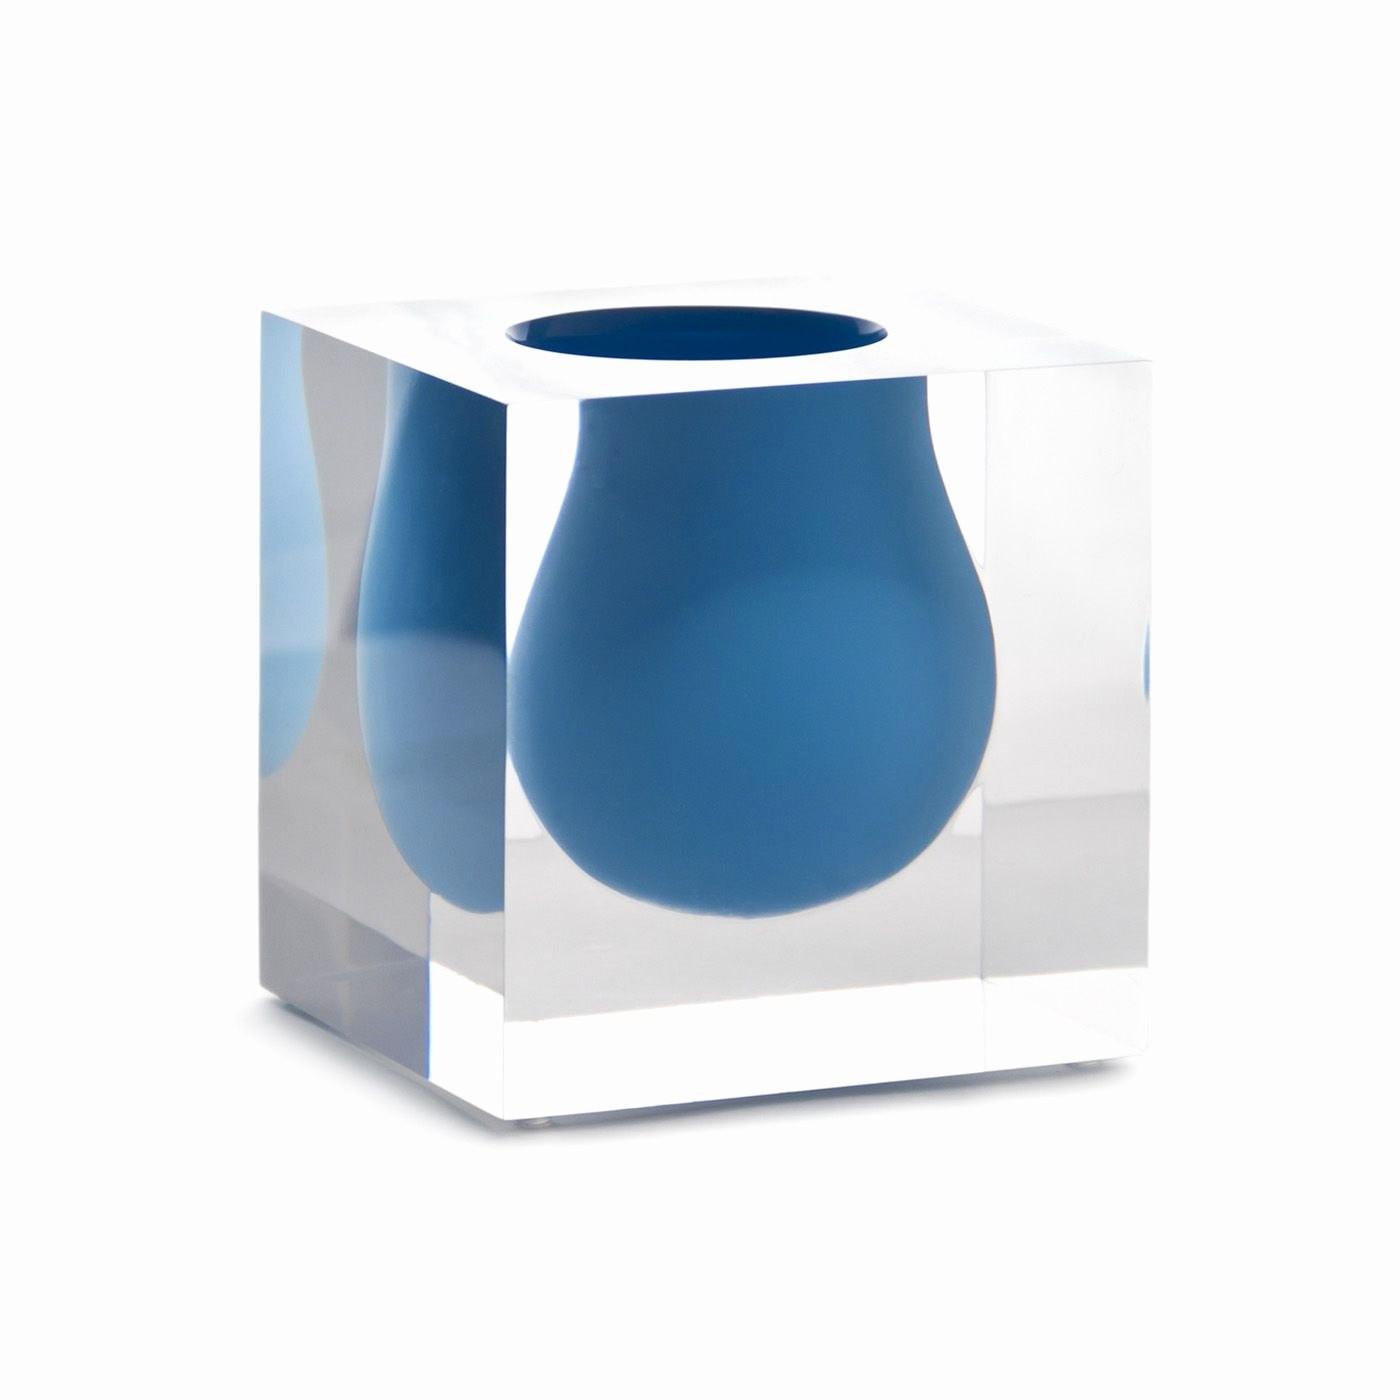 20 tall glass vase of 20 unique very tall decorative vases bogekompresorturkiye com with vases for home decor unique home decor vases unique d dkbrw 5743 1h vases tall wood